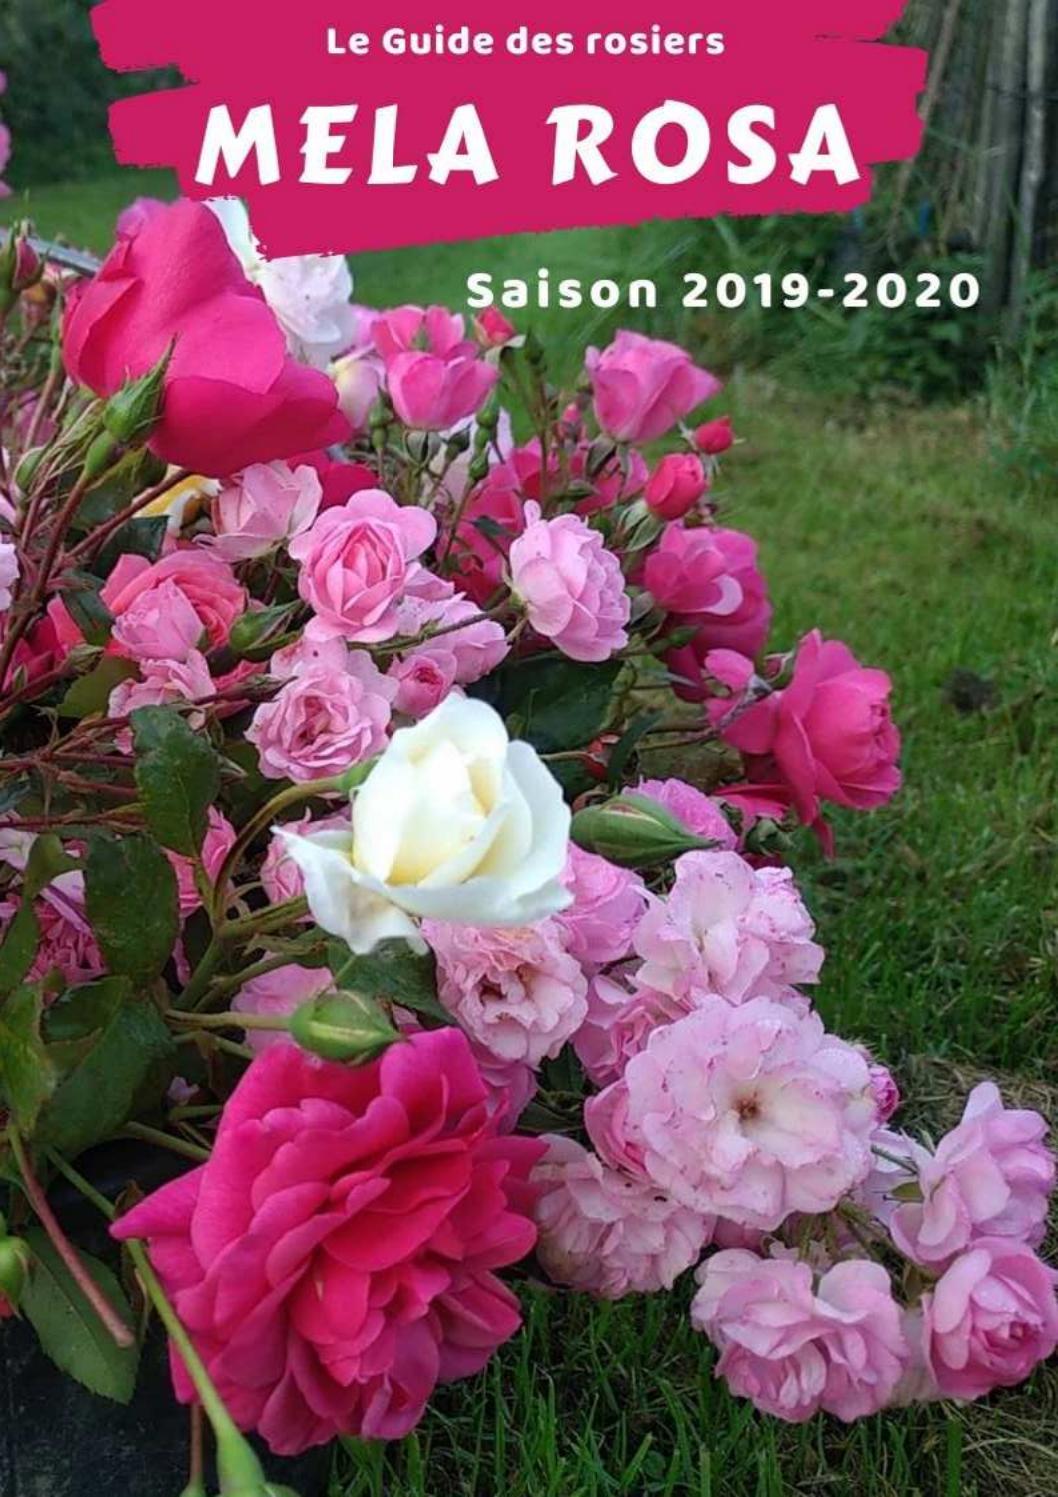 Couper Les Rosiers En Octobre catalogue rosiers melarosa 2019-2020mela rosa - issuu